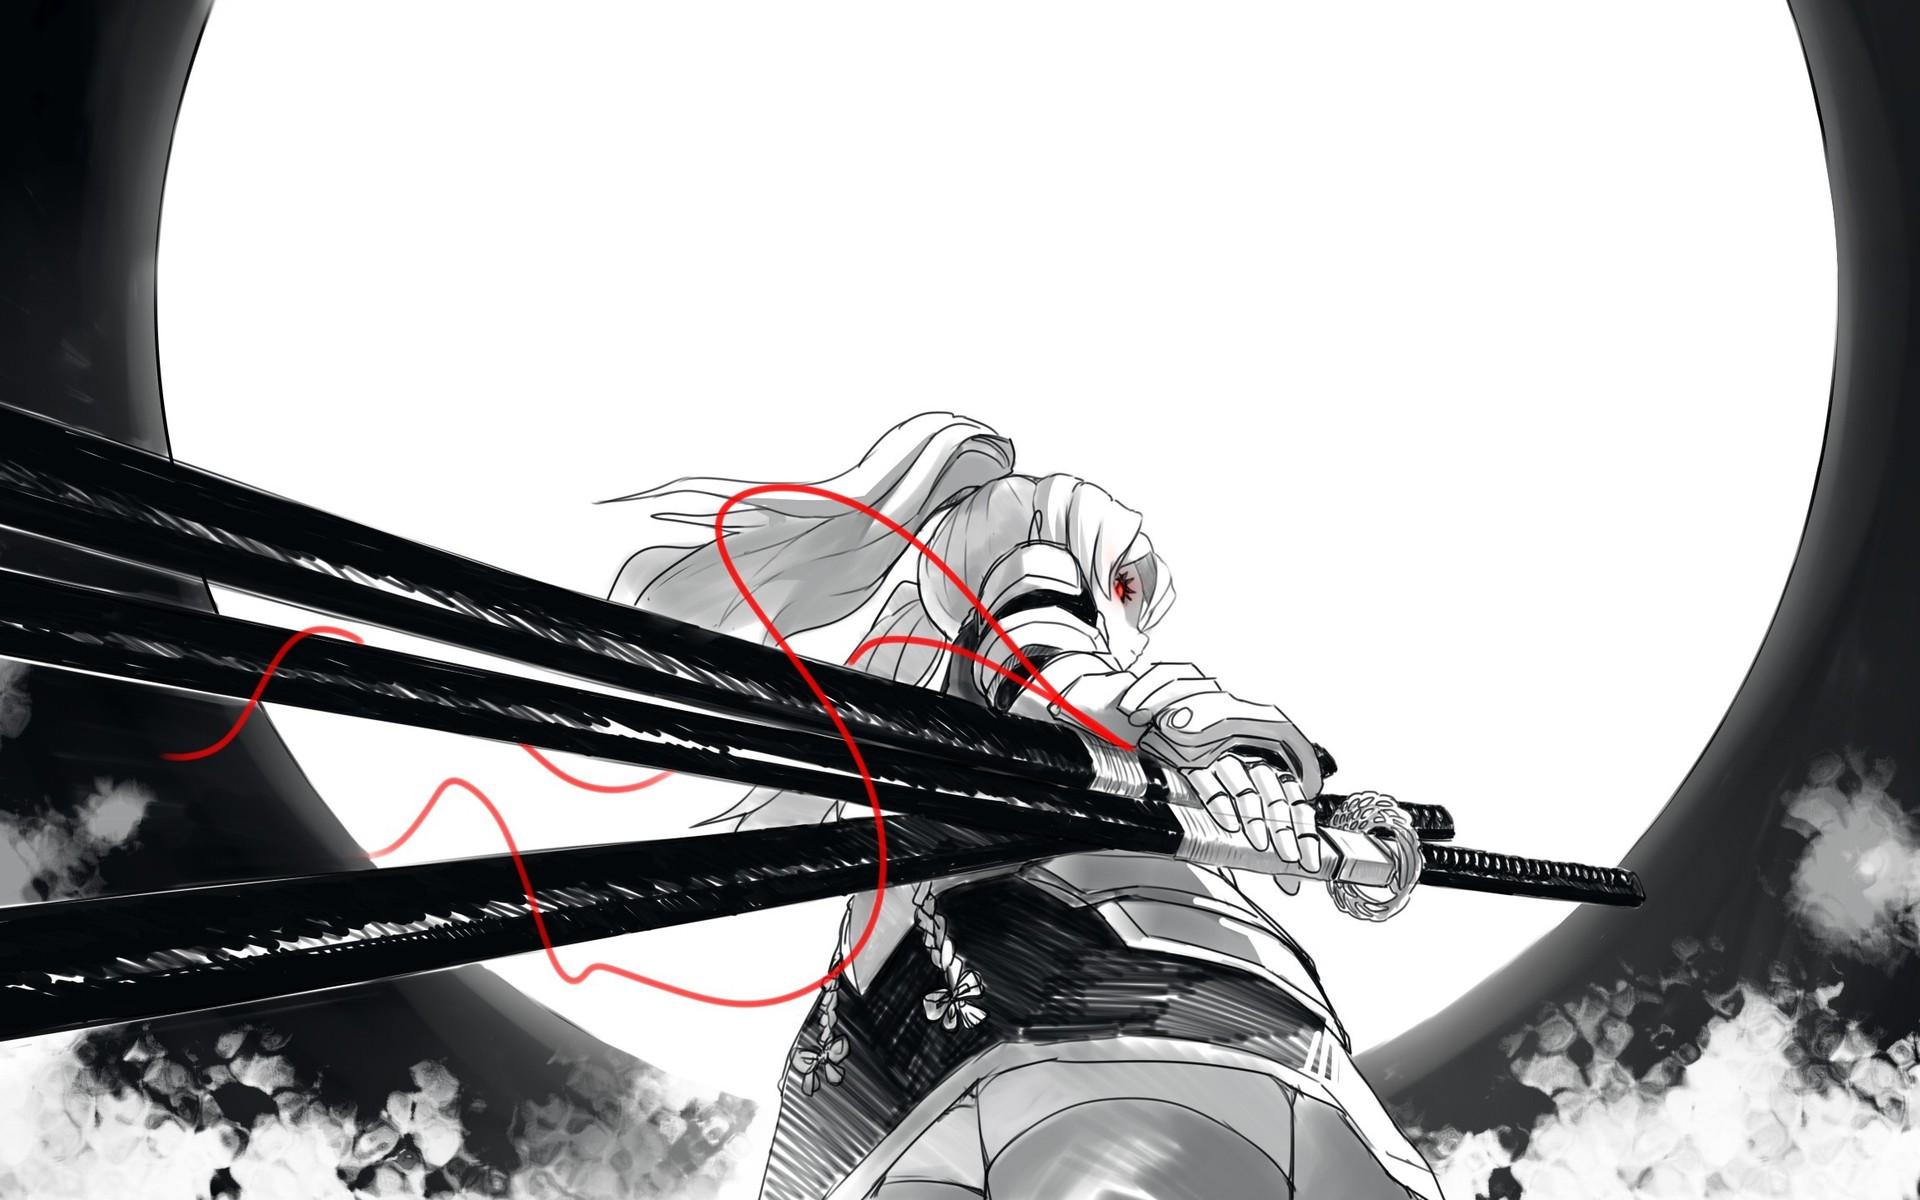 Samurai girl Wallpaper 5217 1920x1200